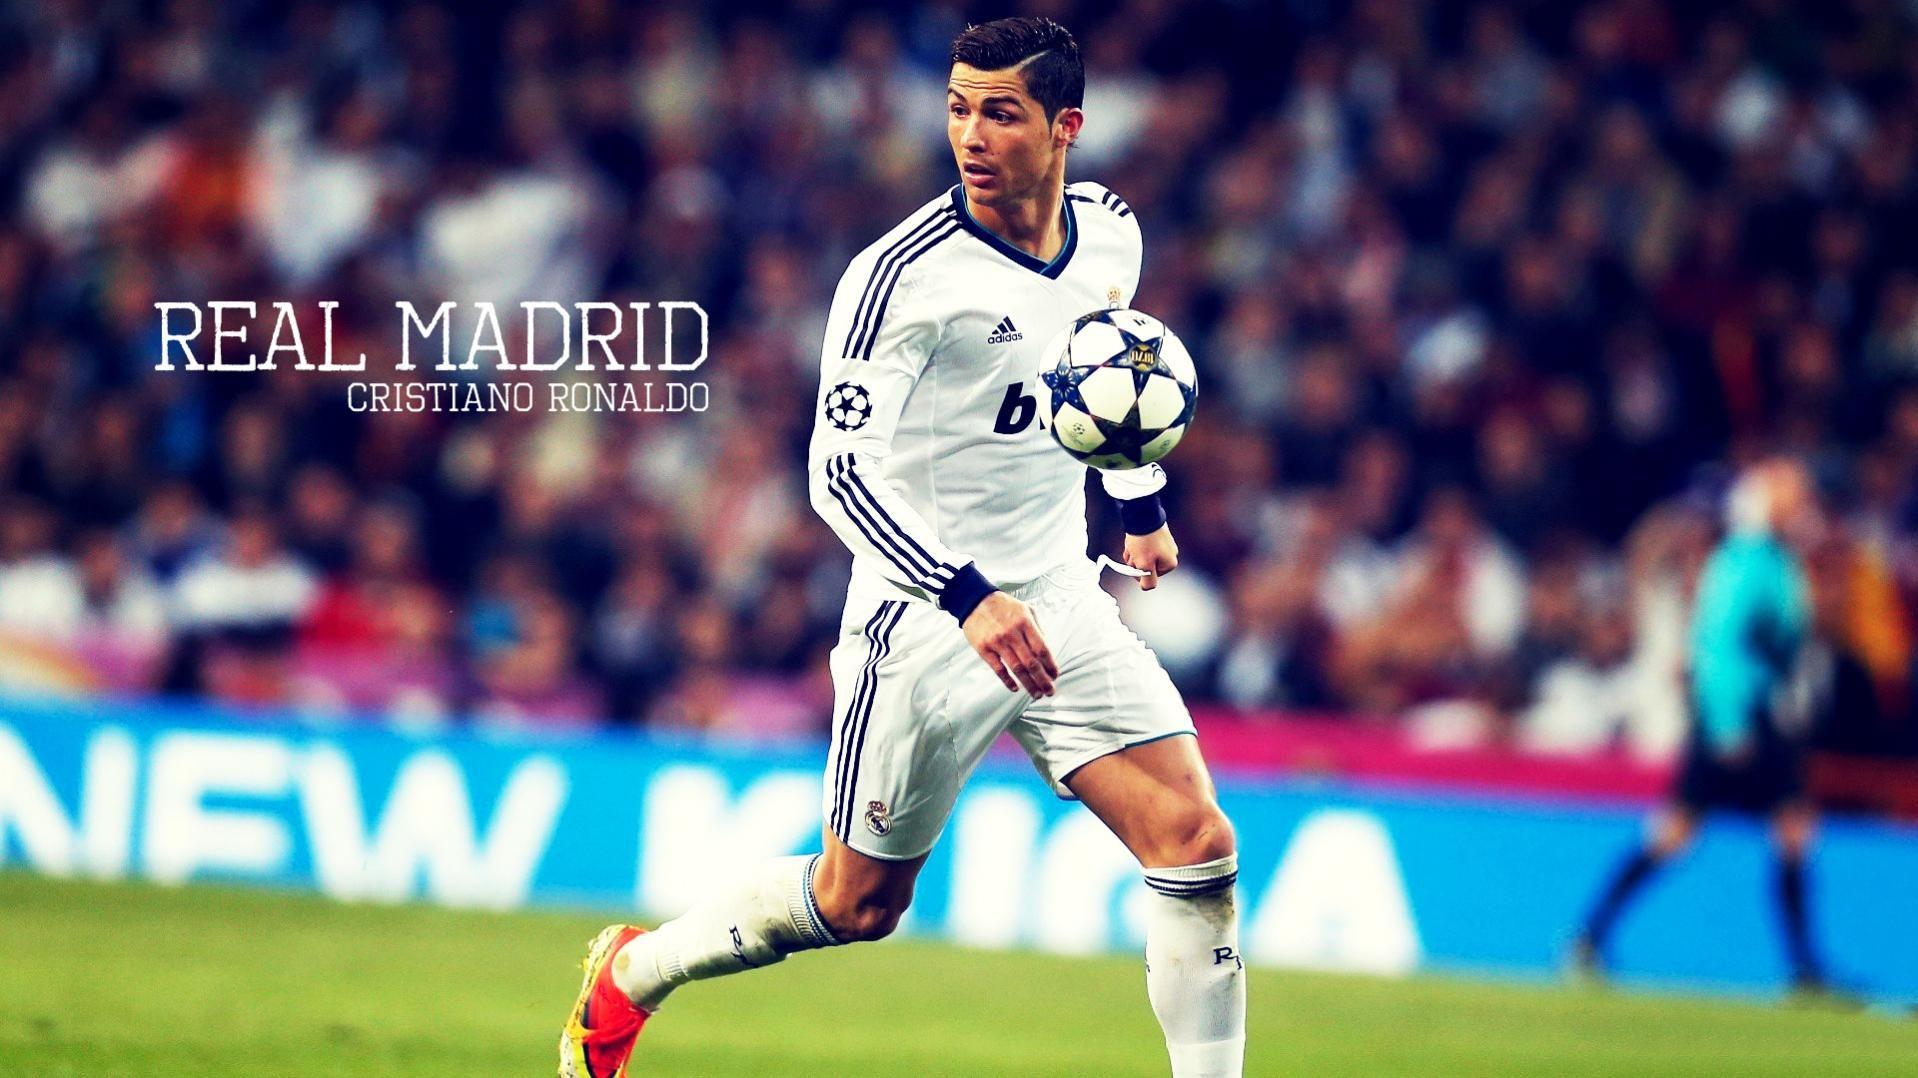 Cristiano Ronaldo Wallpaper 22 Best Wallpaper Collection Cristiano Ronaldo Ronaldo Cristiano Ronaldo Wallpapers